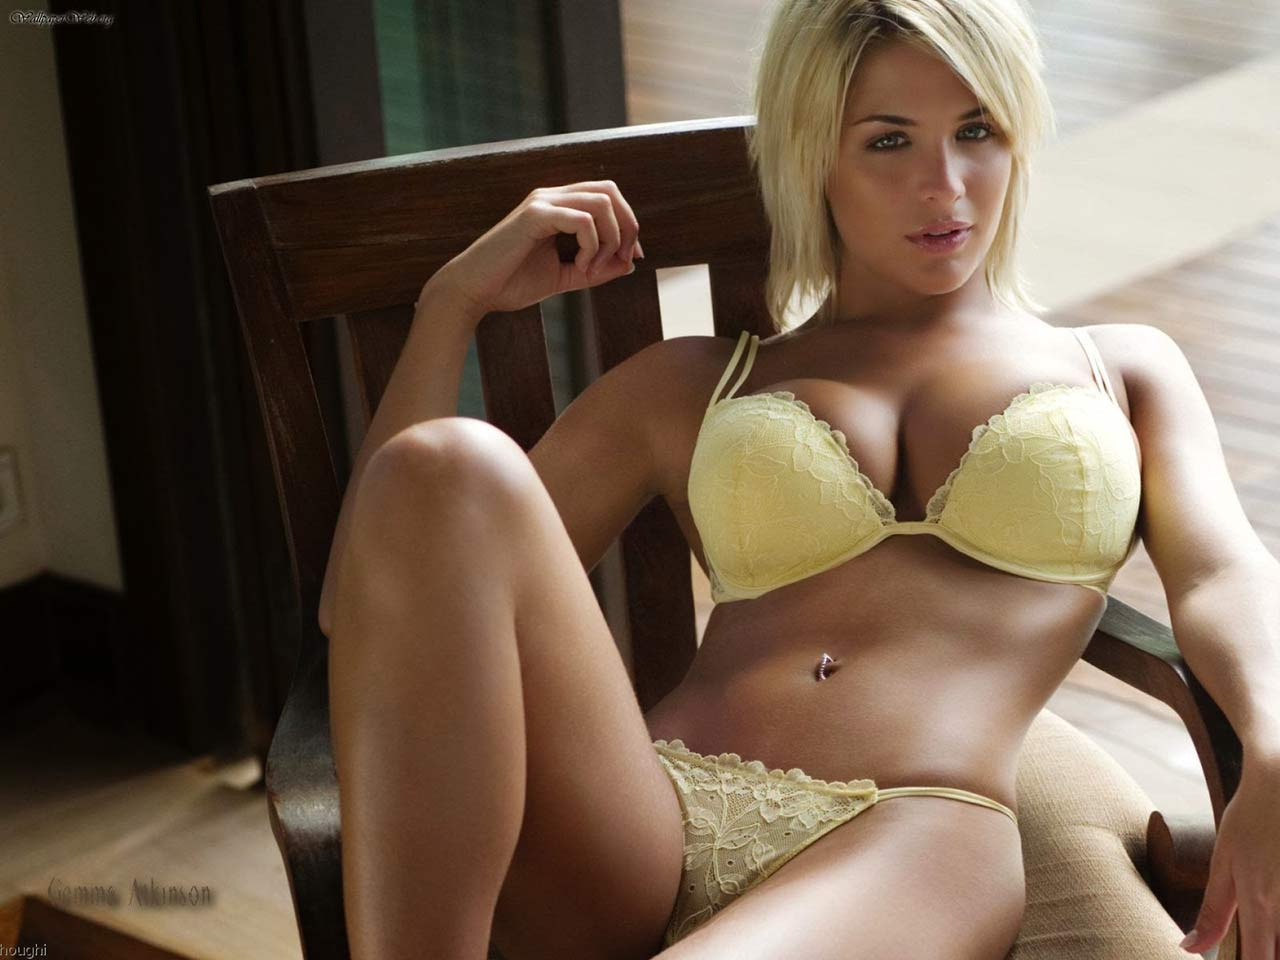 Gemma Atkinson Nude Leaked Photos - Scandal Planet